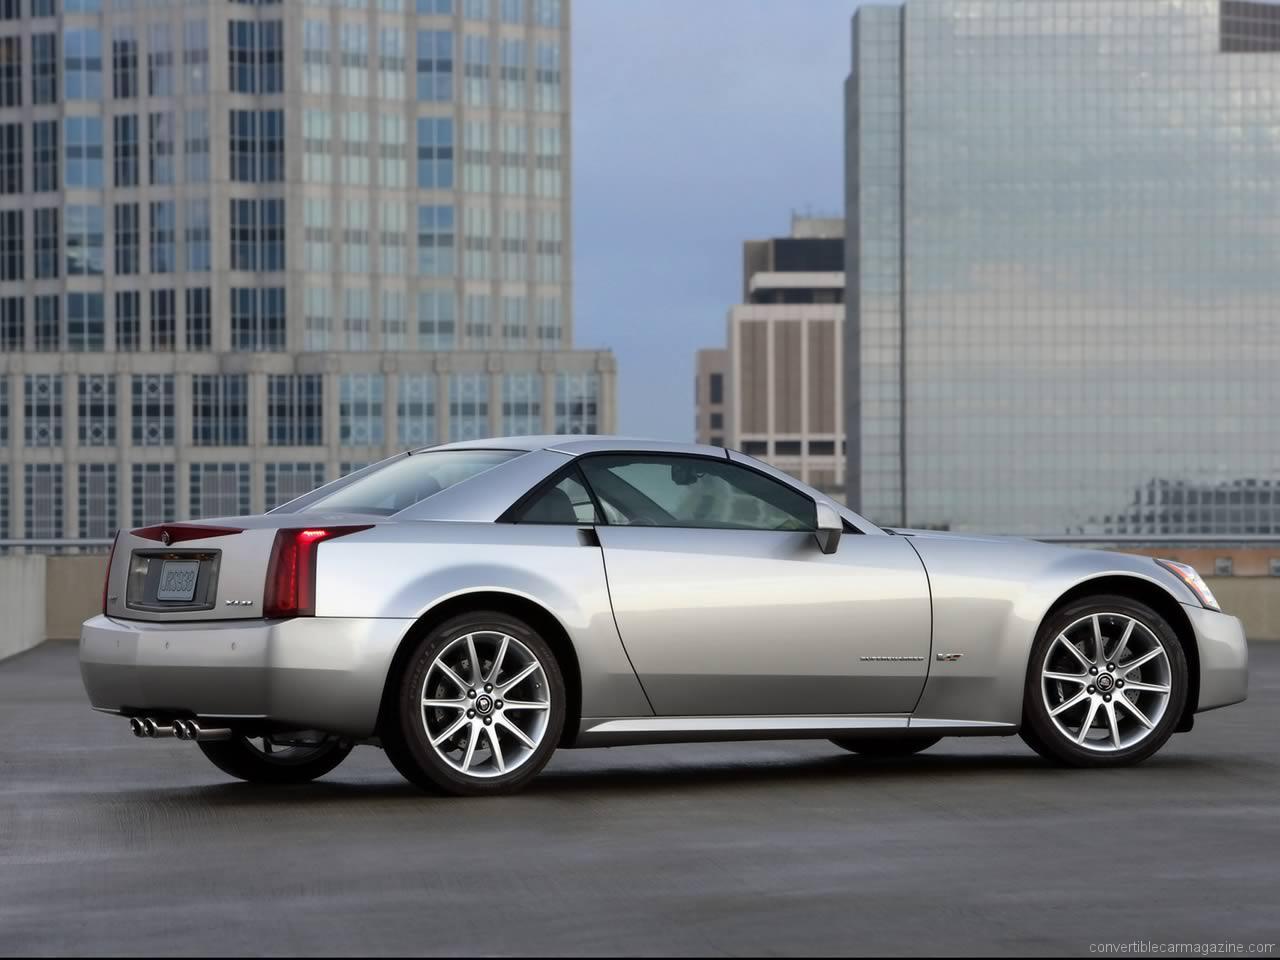 Cadillac Xlr Convertible Buying Guide